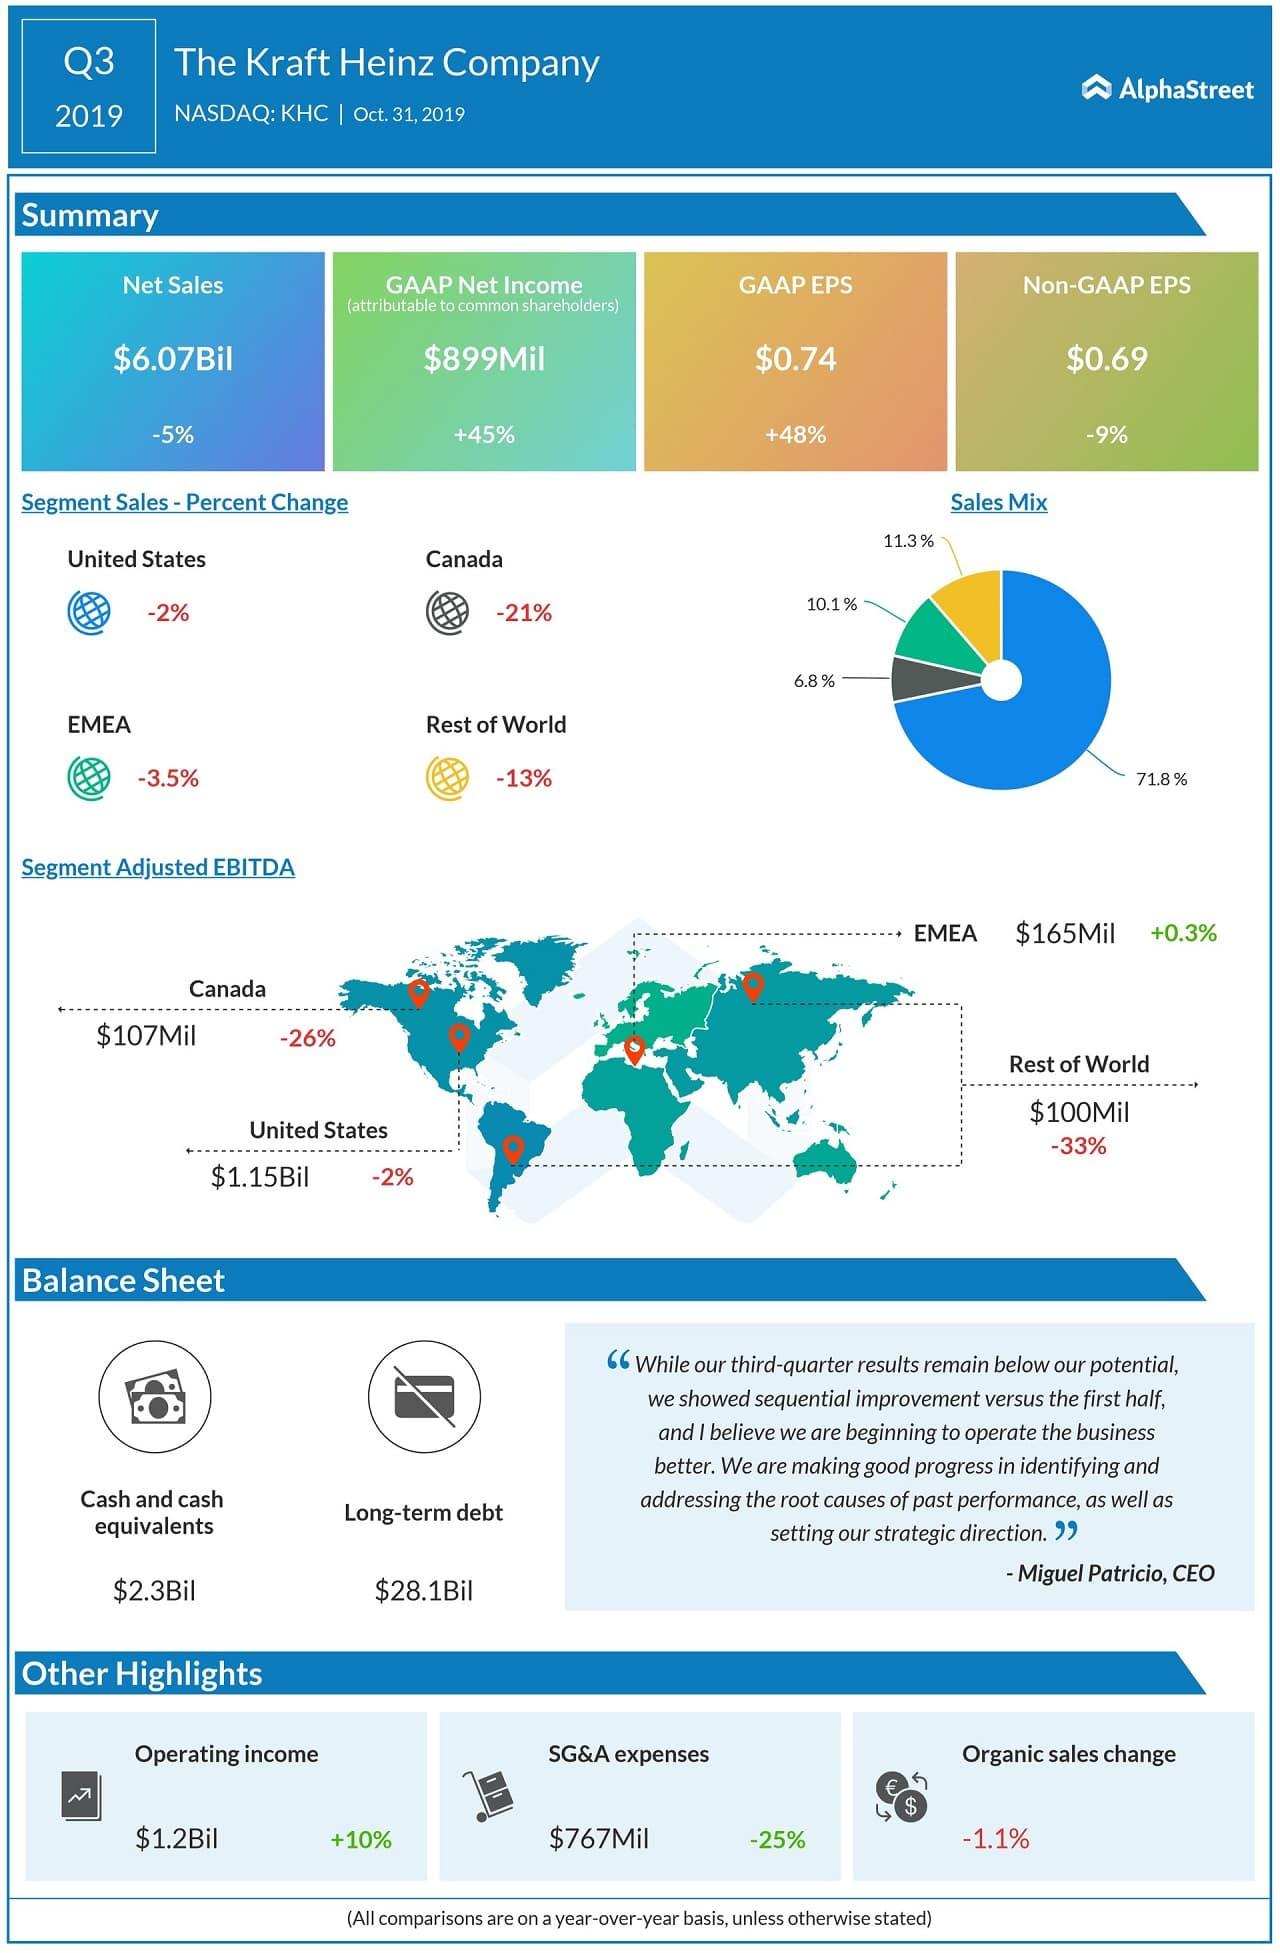 Kraft Heinz (KHC) Q3 2019 earnings results